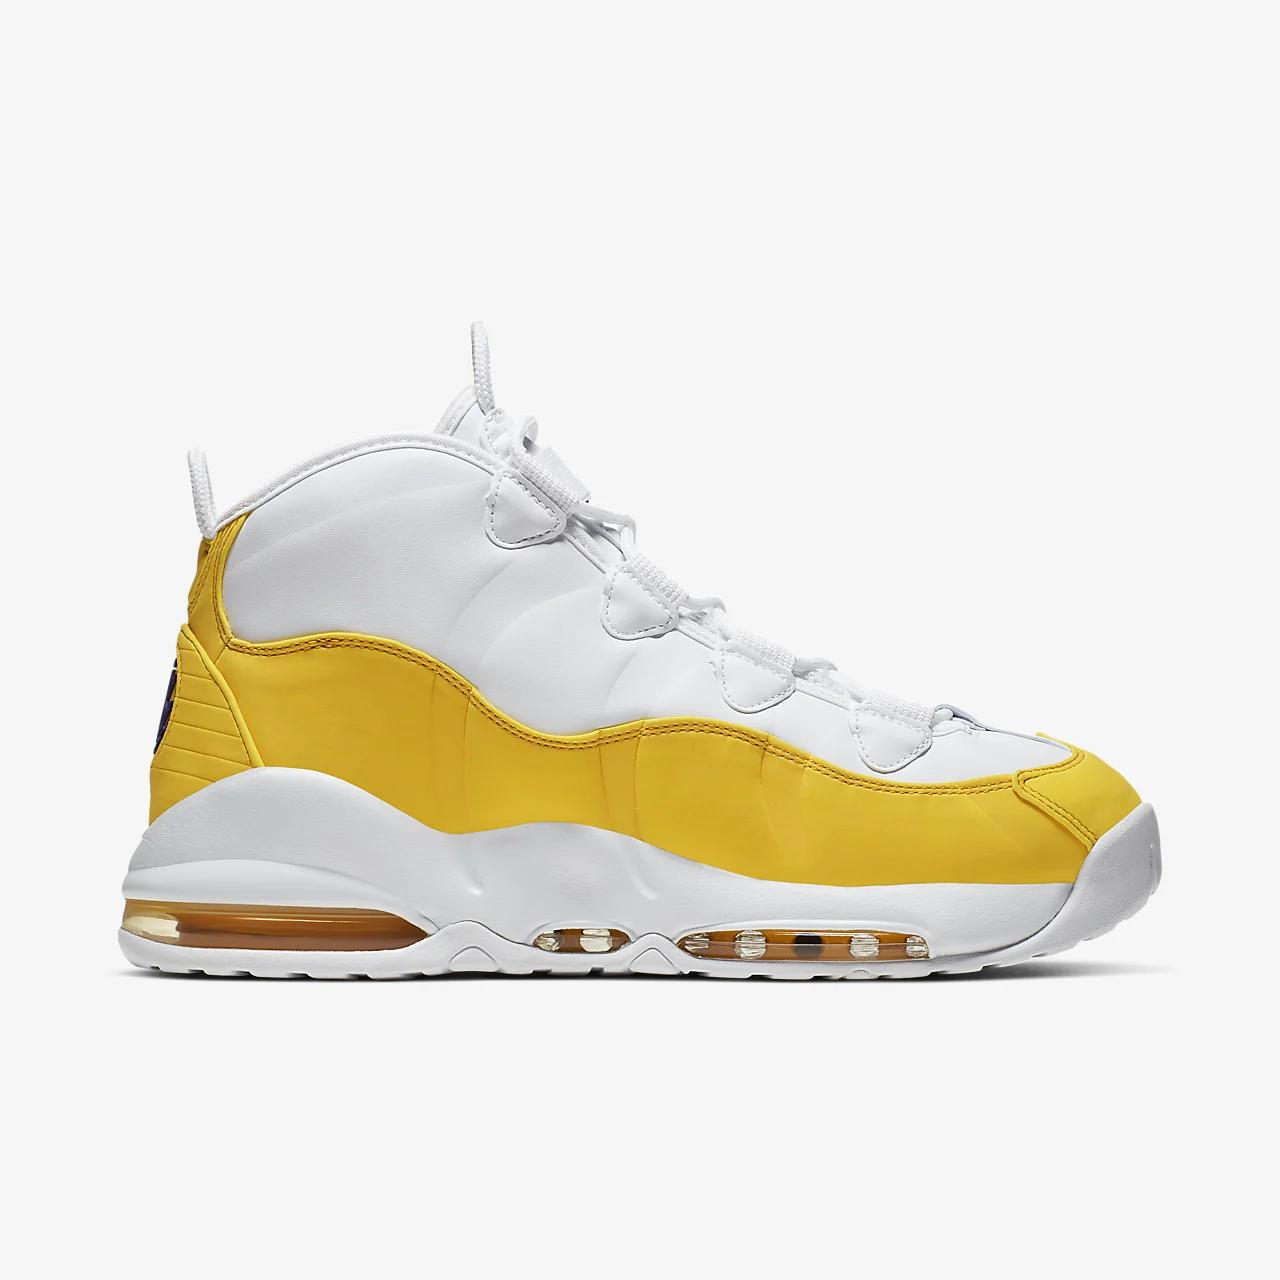 Nike Air Max Uptempo '95 Men's Shoe CK0892-102